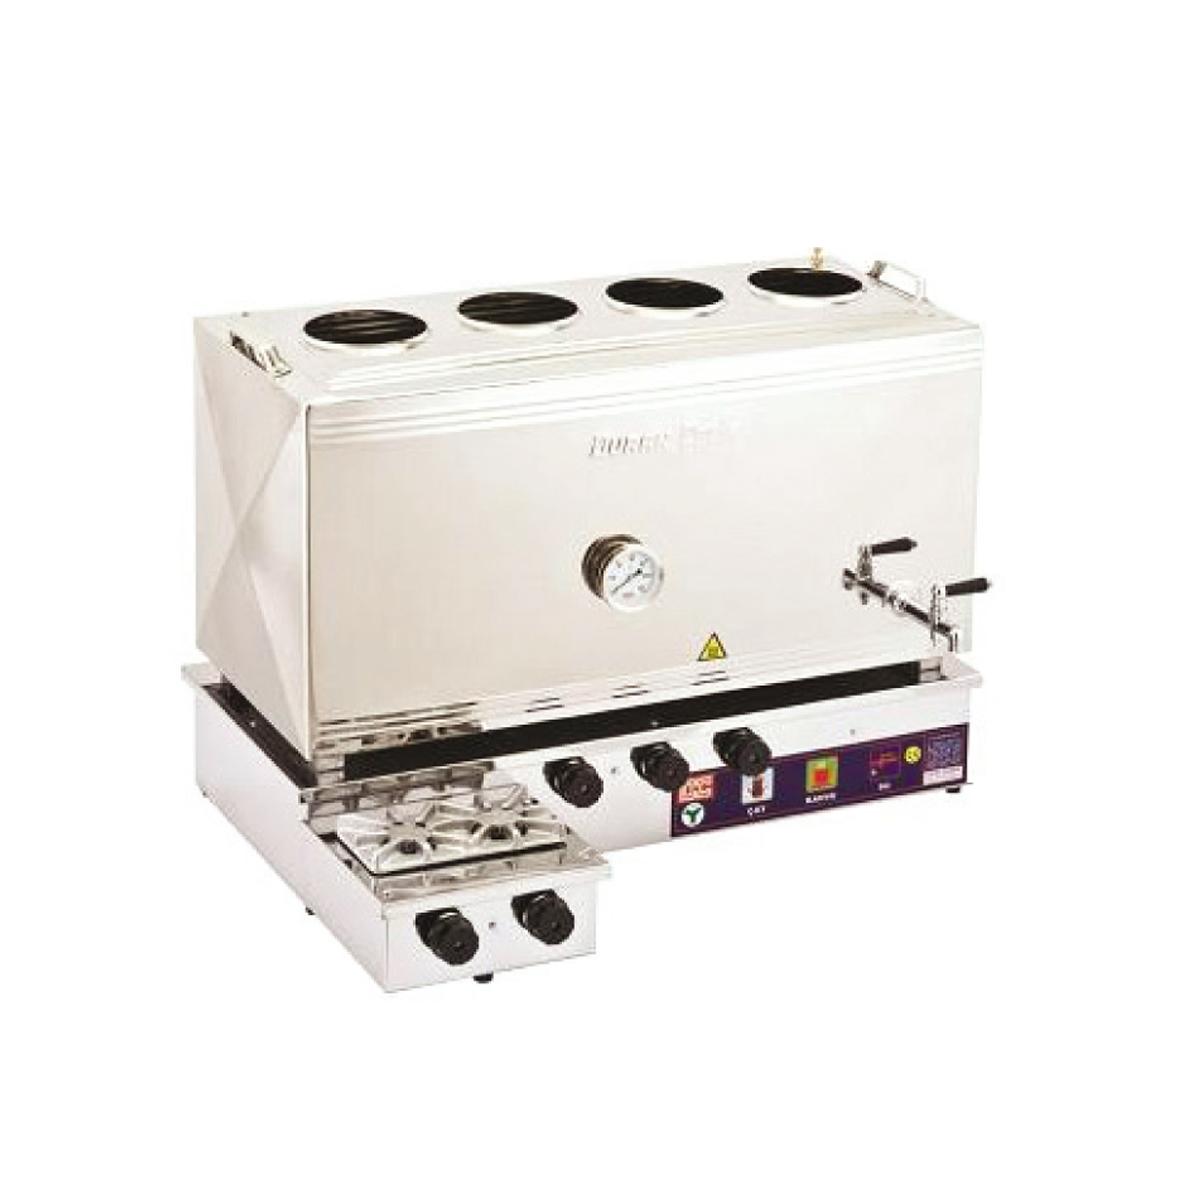 Tea Boiler Welded 80 - Electric